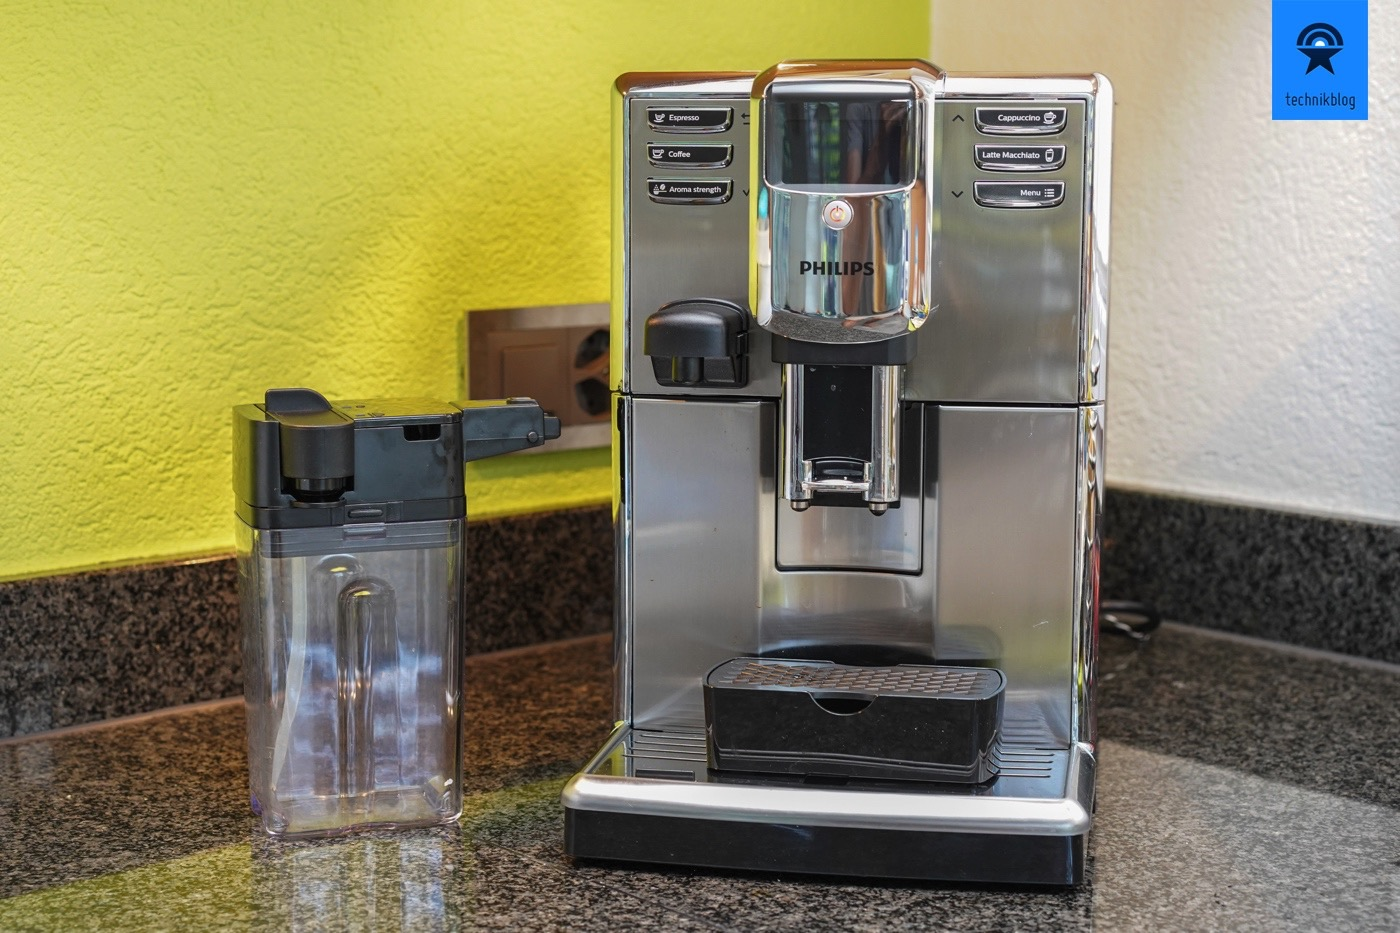 Philips Kaffeevollautomat 5000 Serie im Test